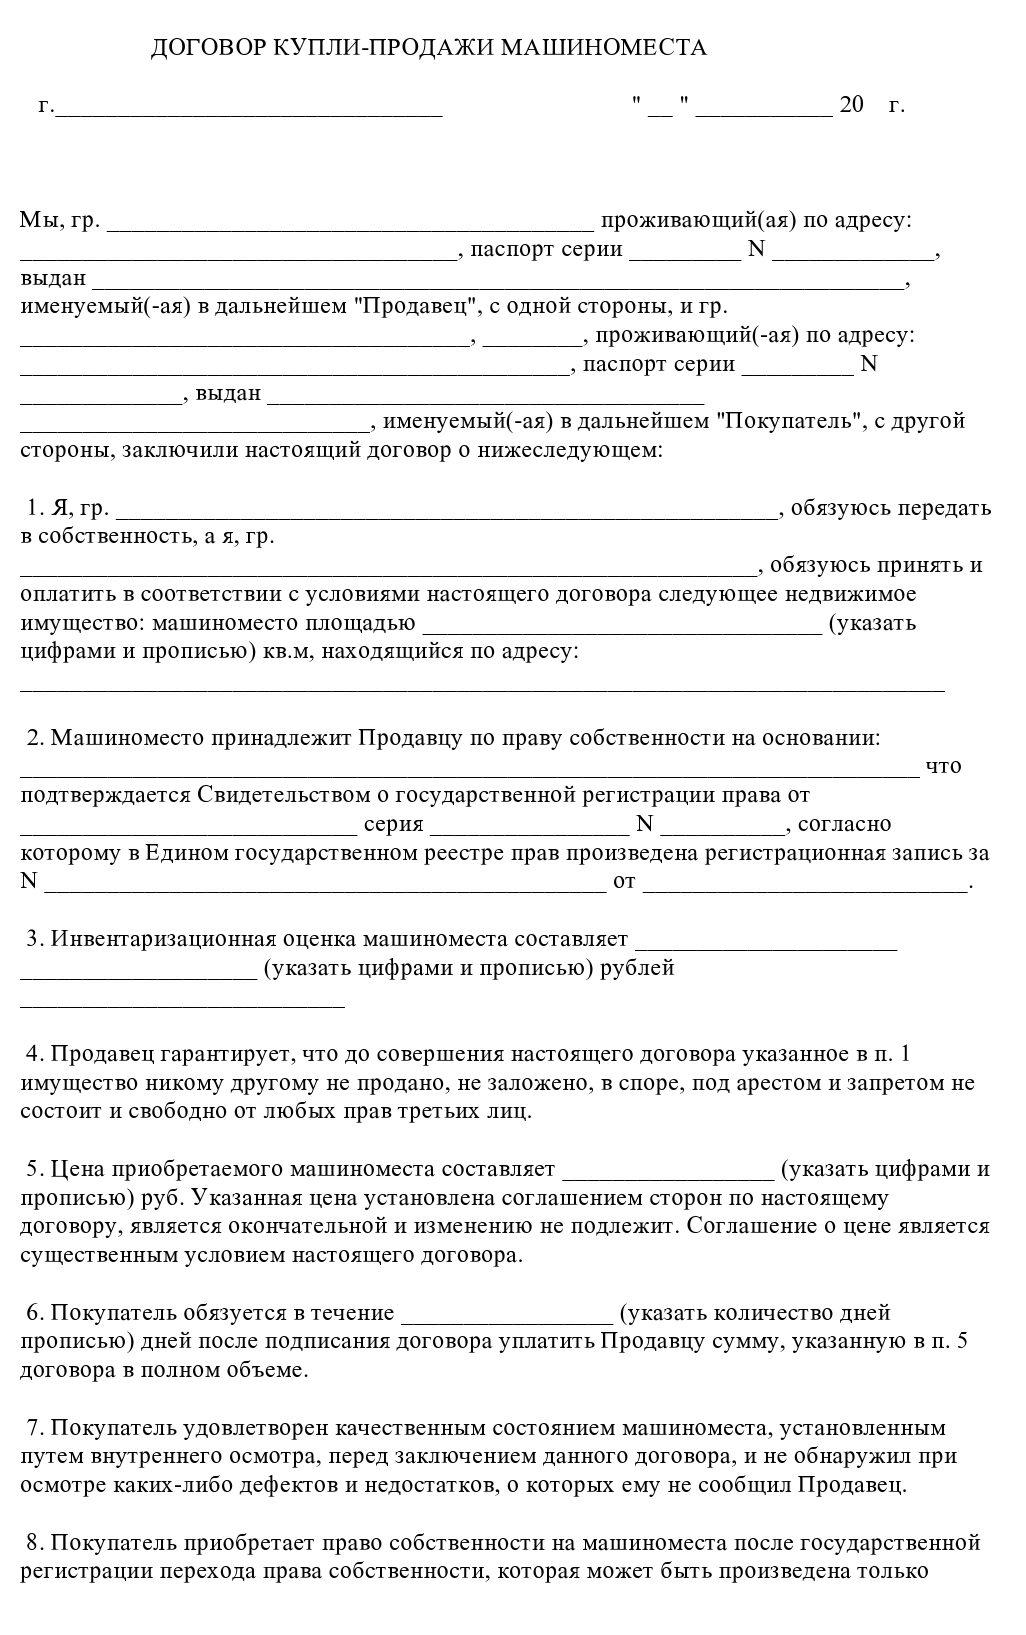 Образец договора купли-продажи машиноместа